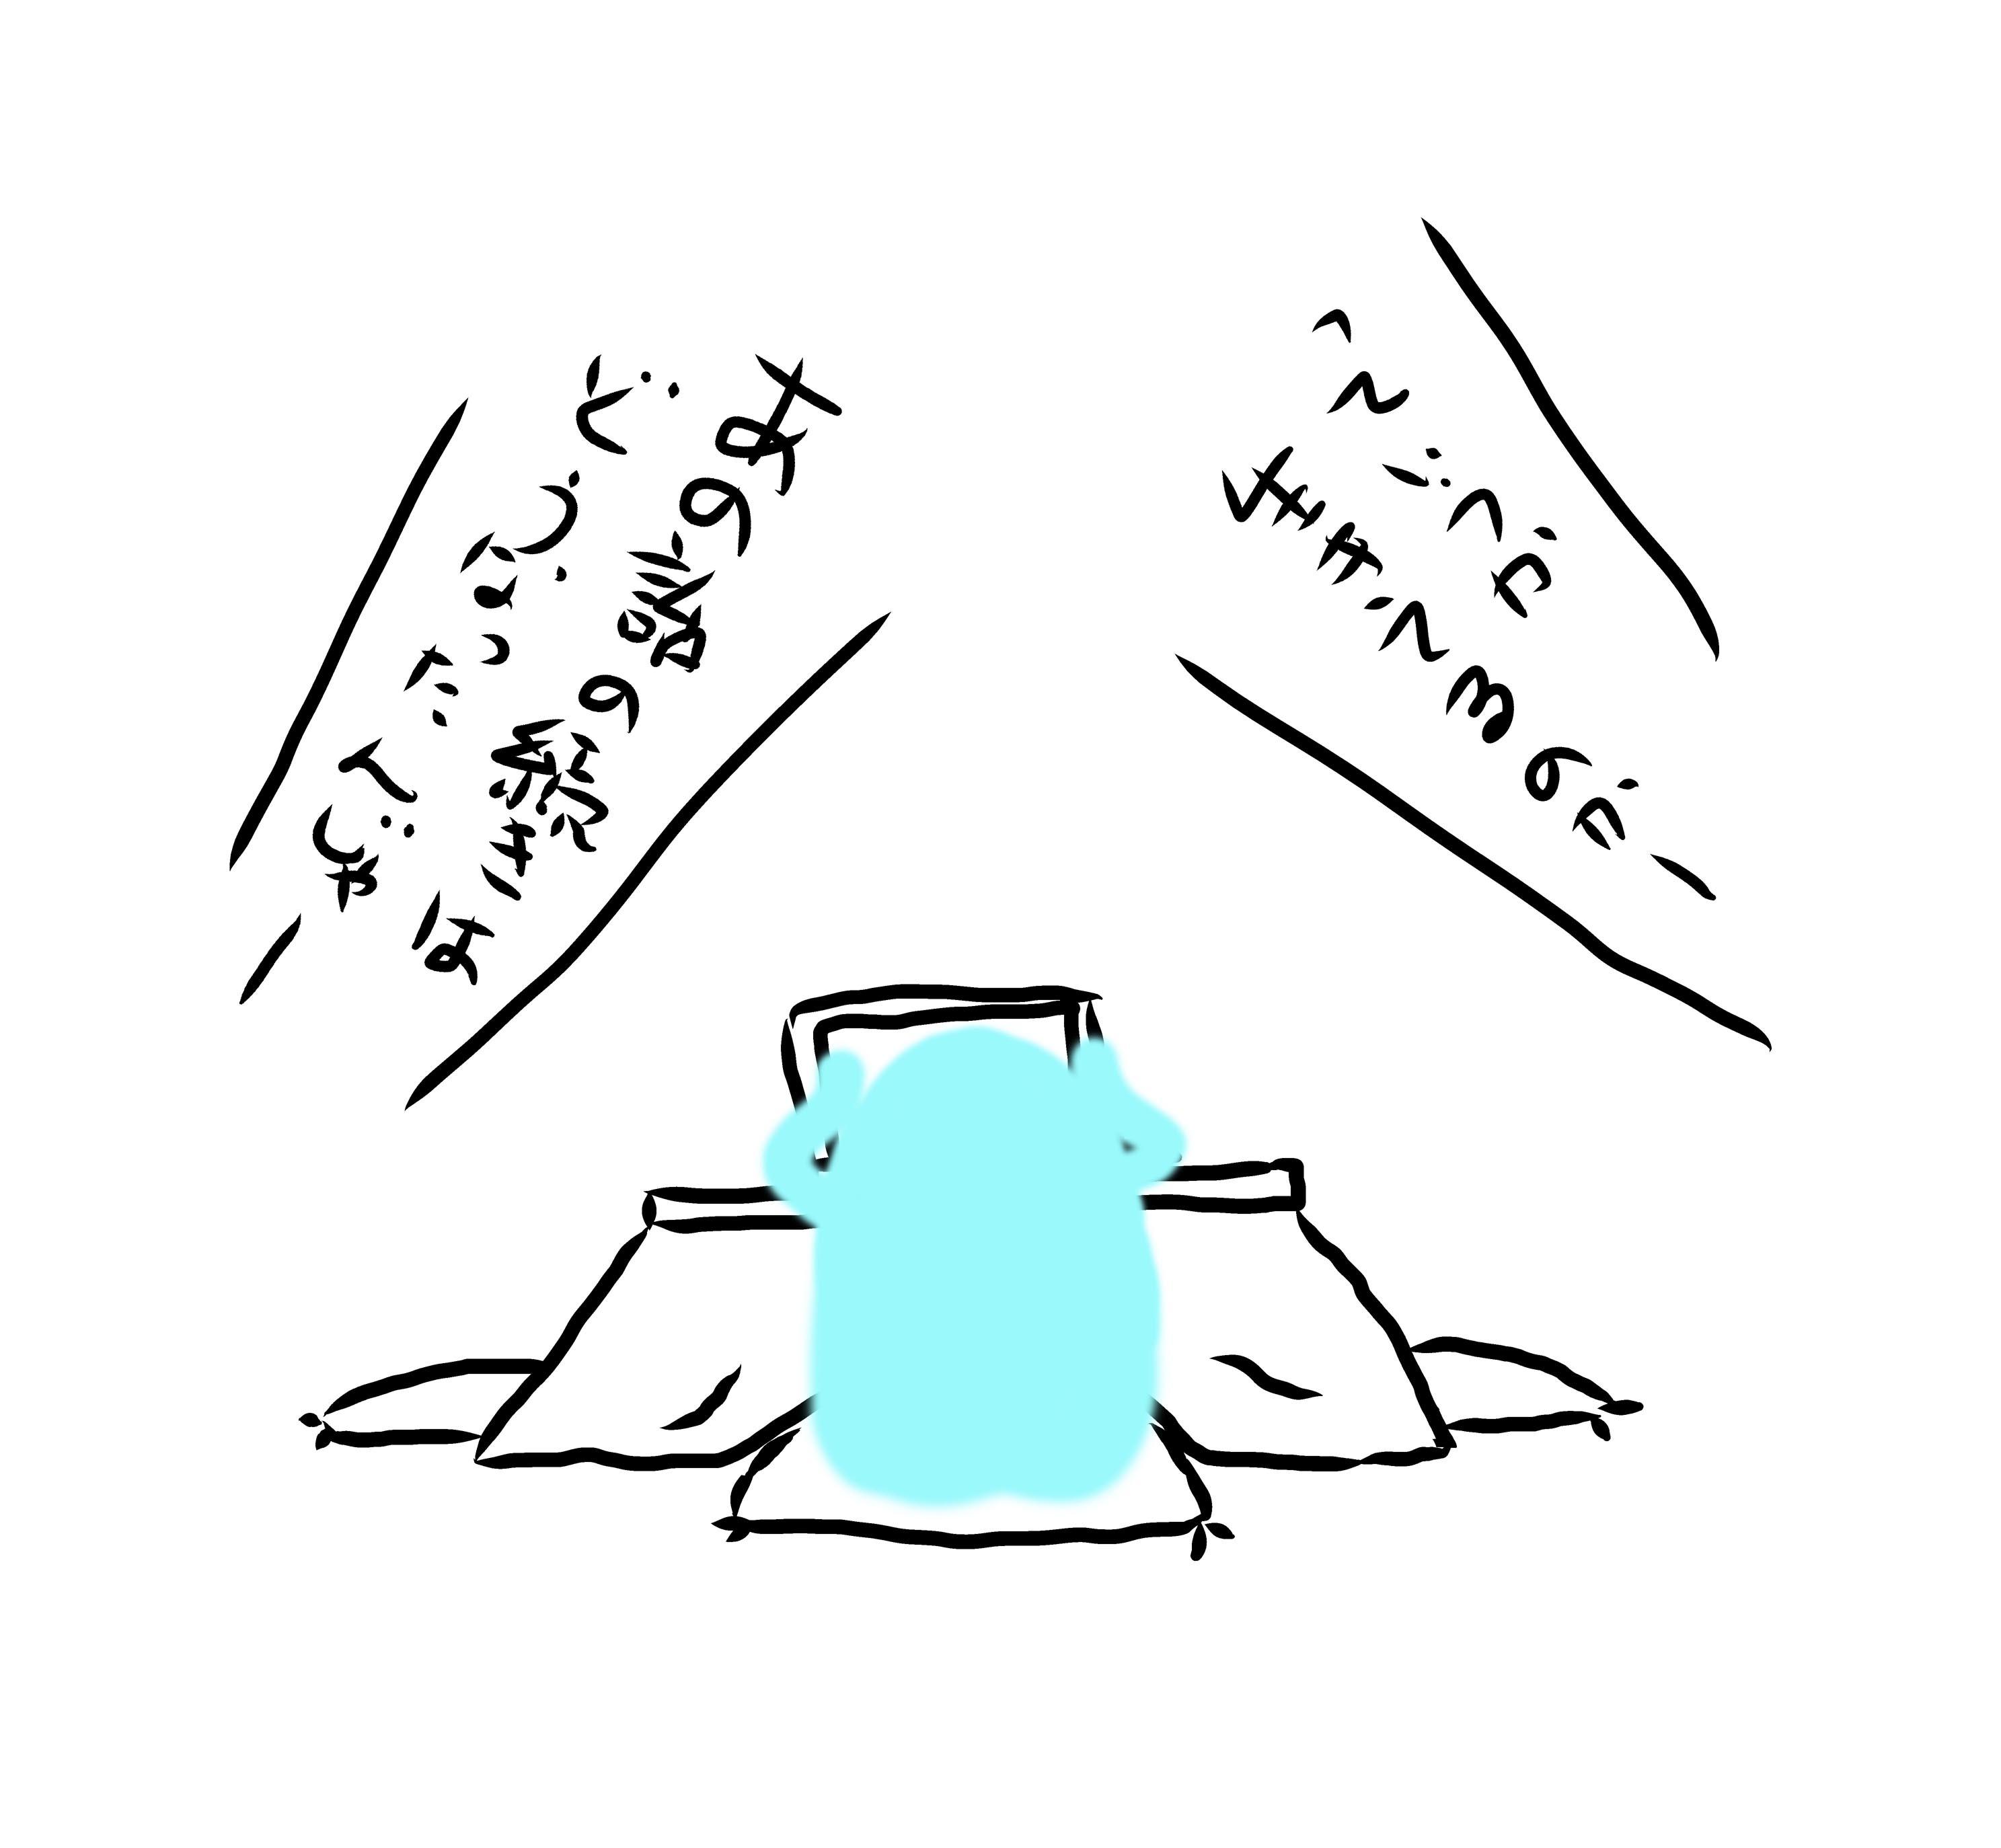 c0166765_2046352.jpg